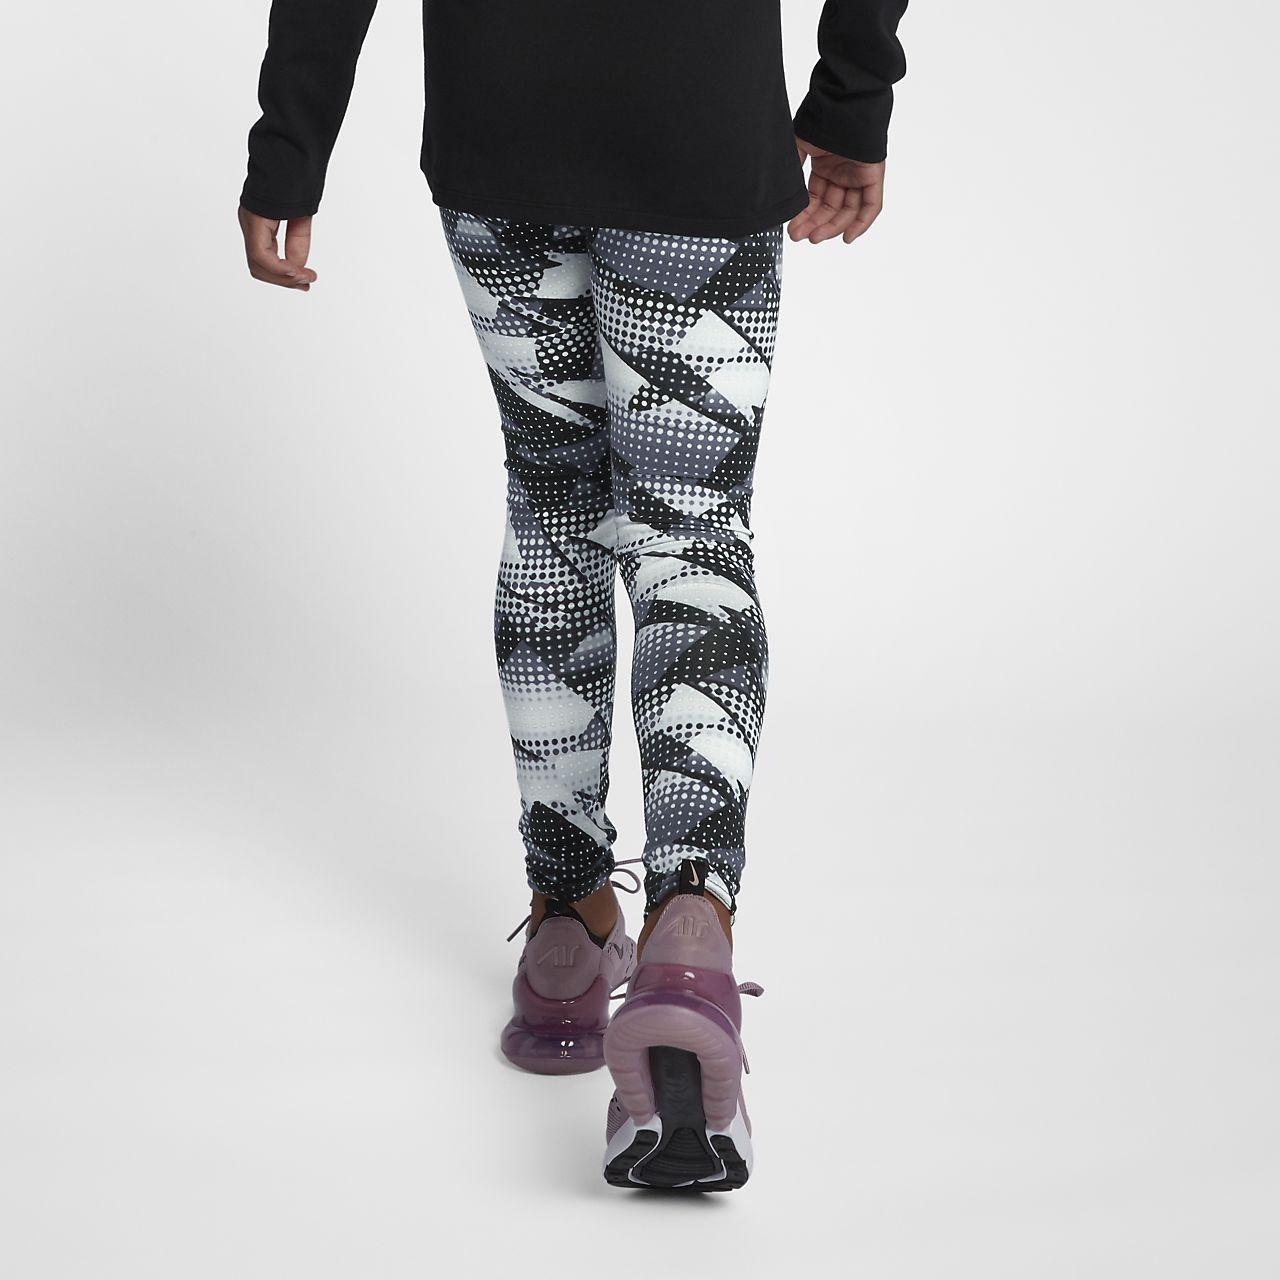 fdfea6785d Nike Sportswear mintás leggings nagyobb gyerekeknek (lányok). Nike ...